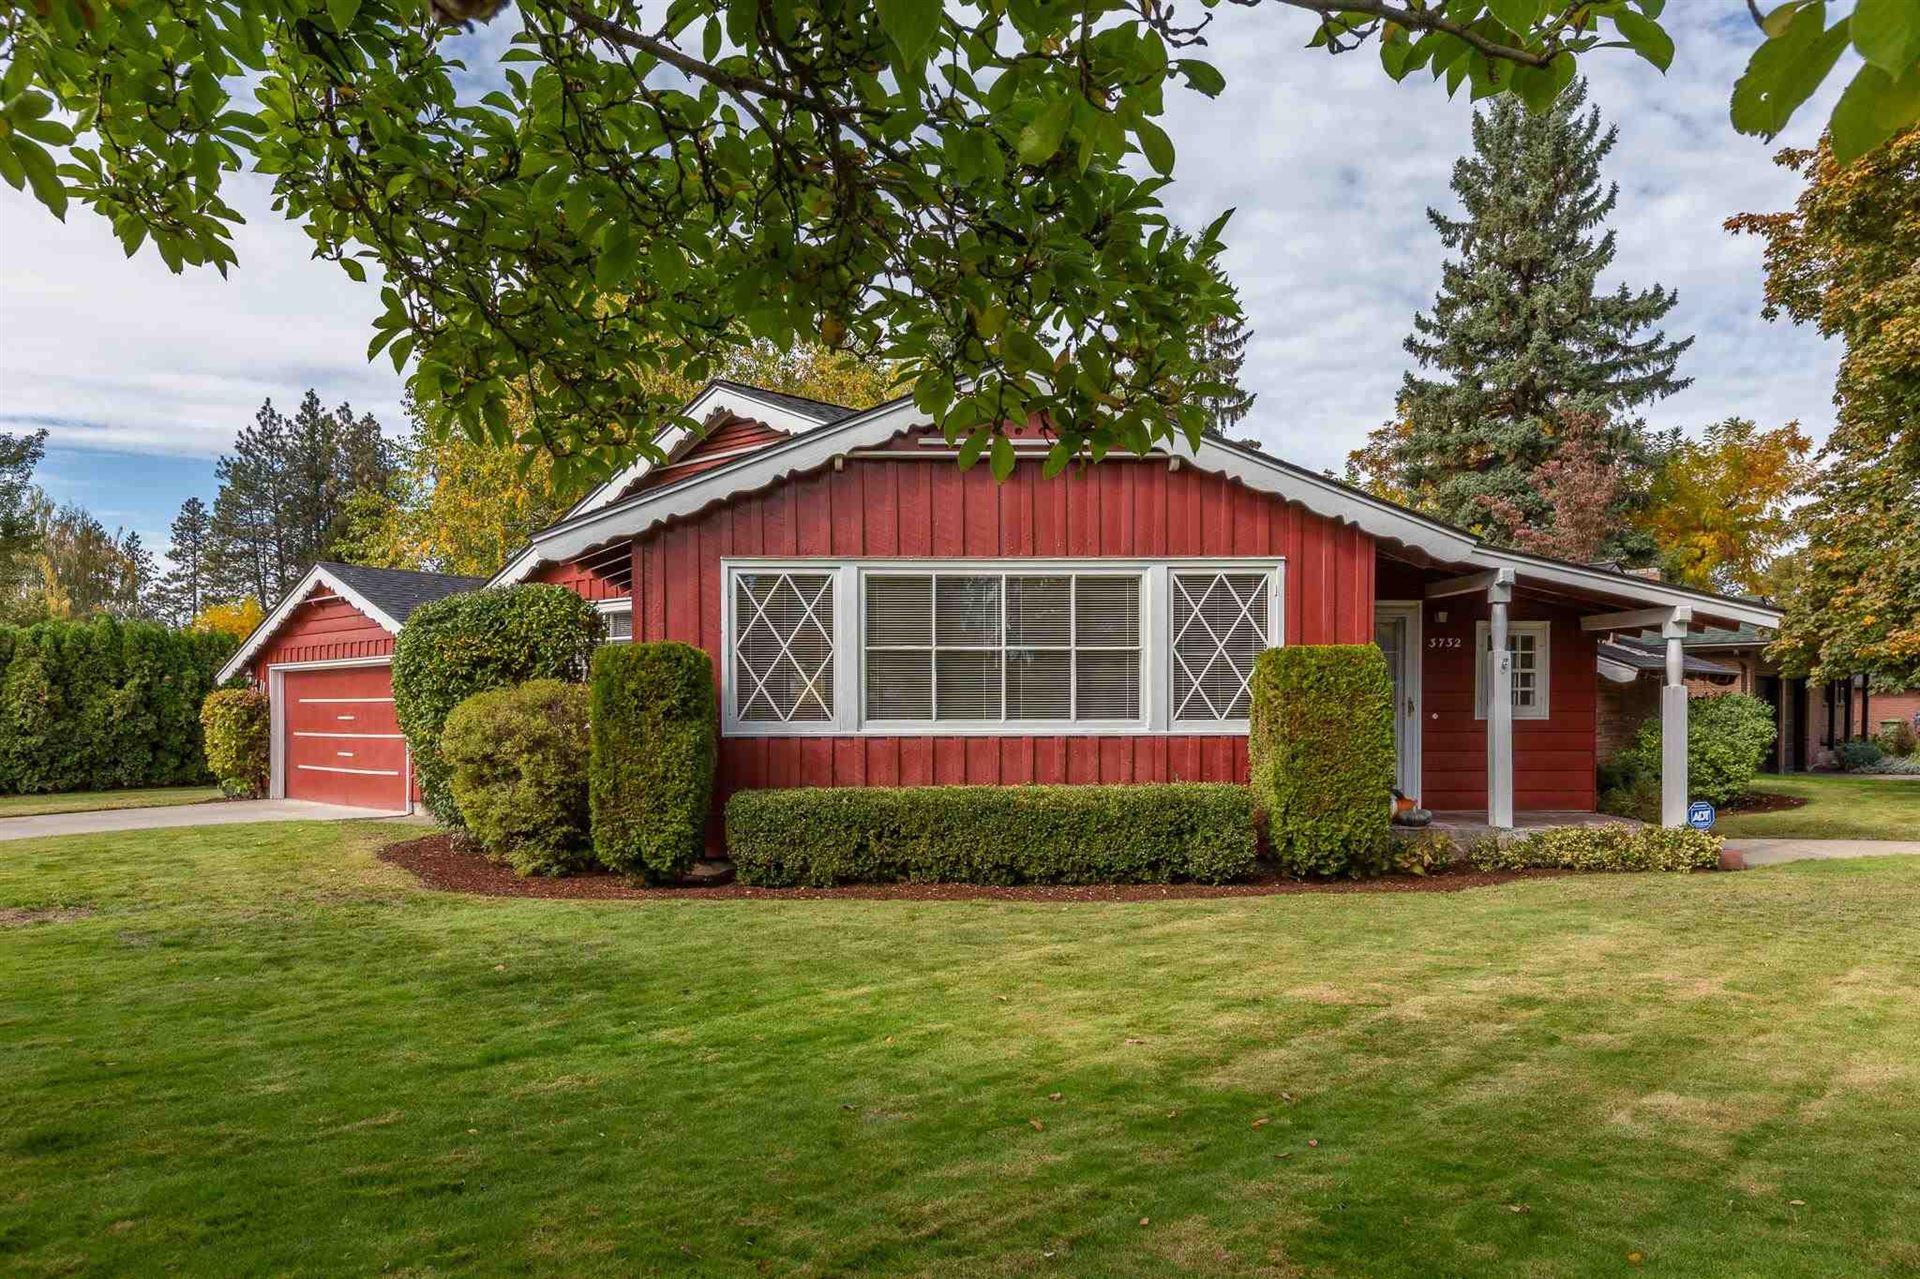 3732 S Manito Blvd, Spokane, WA 99203-1523 - #: 202123420